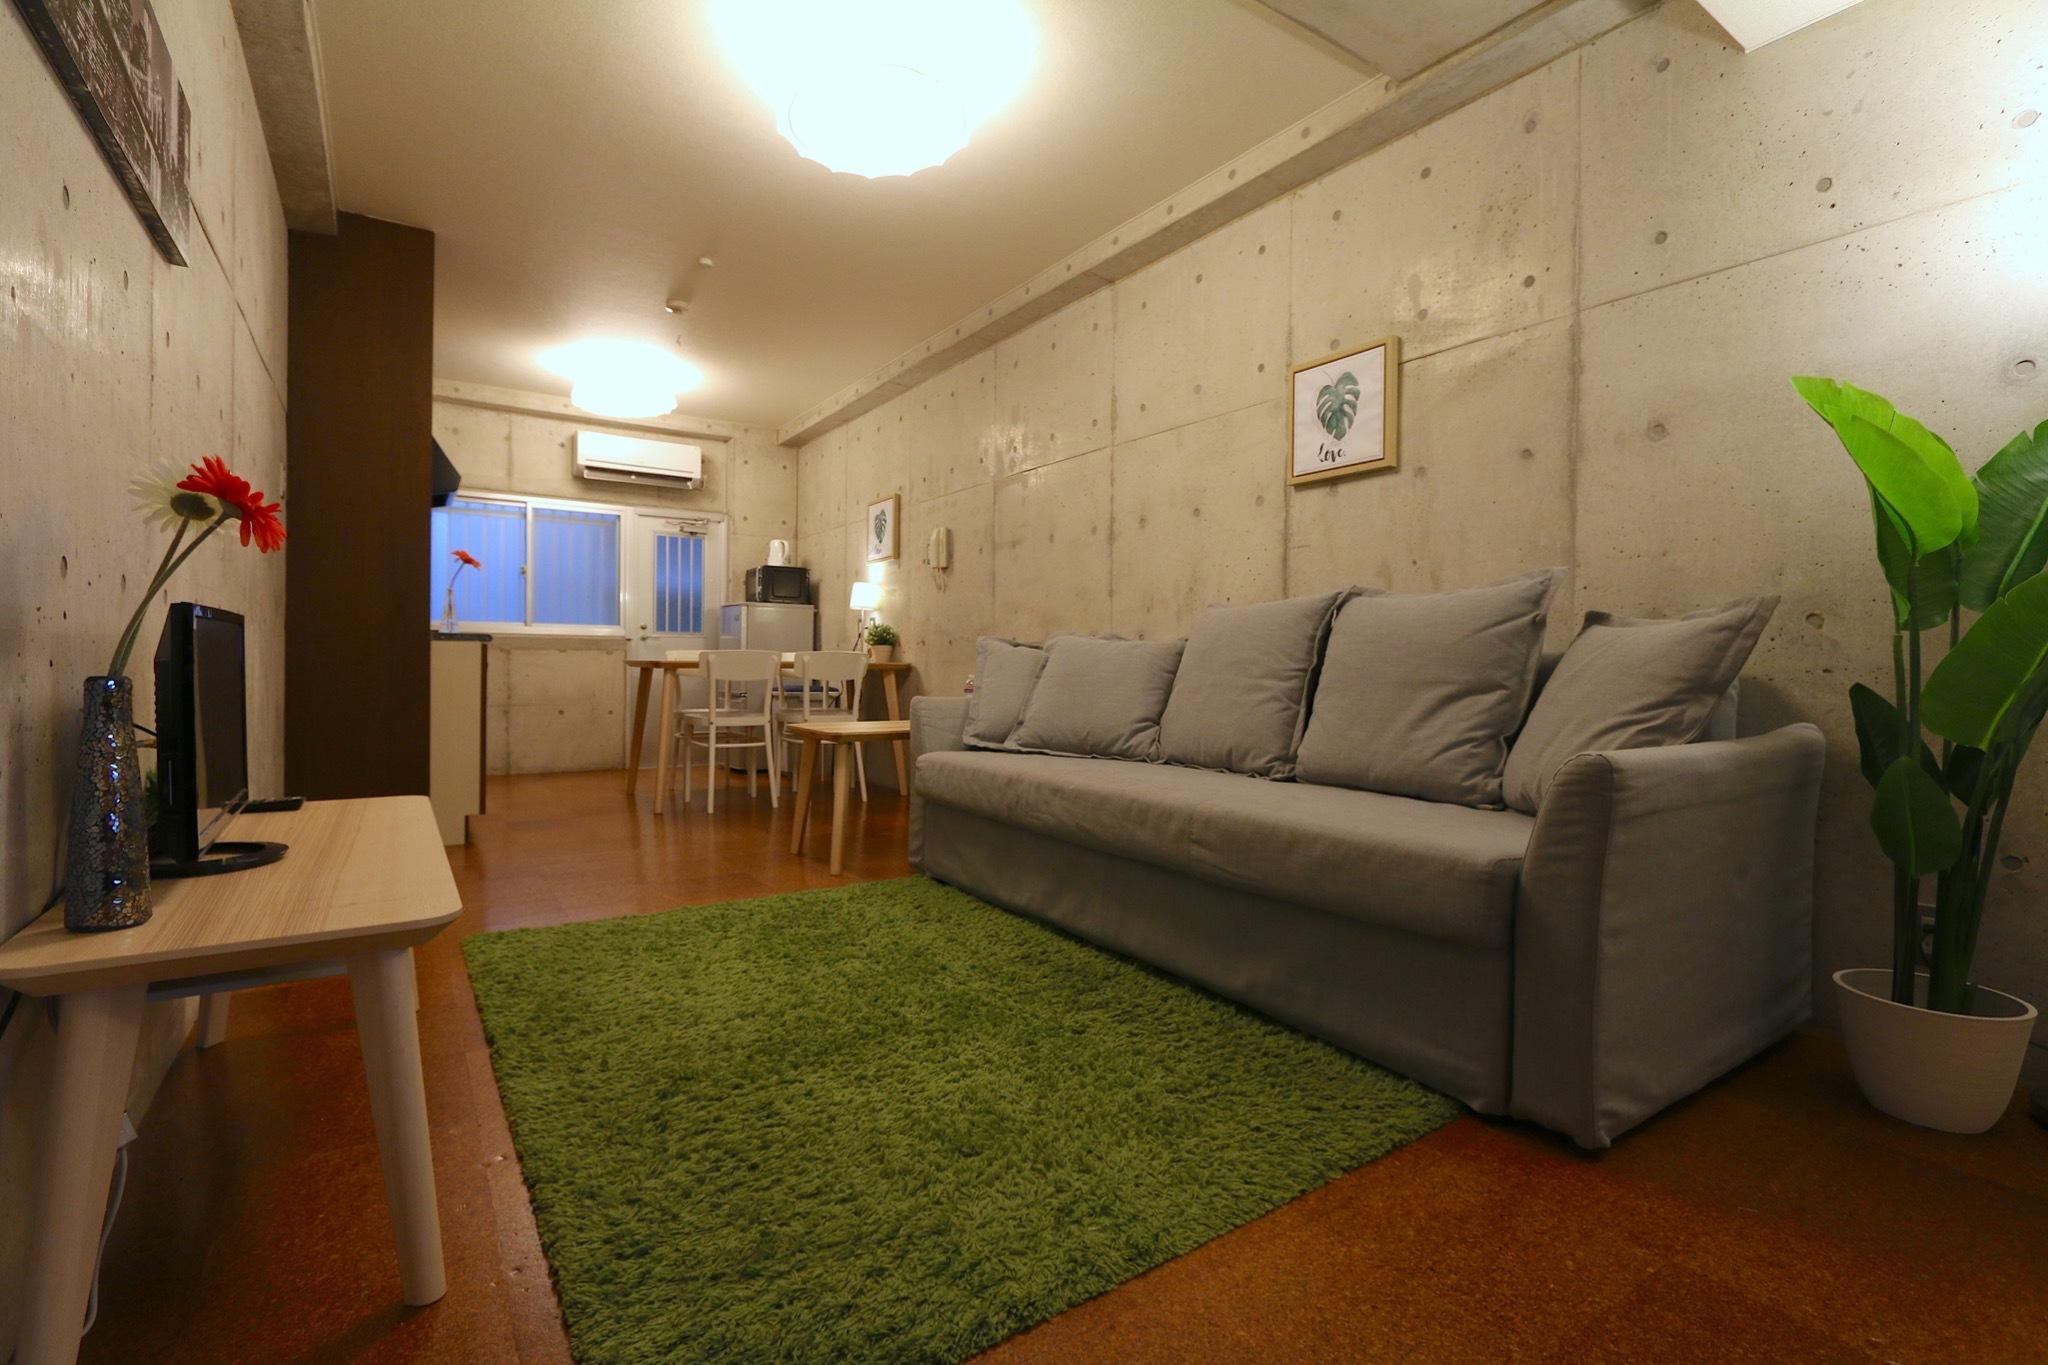 KU1 ★梅田 3階建一軒家まるまる貸切 最大11名★中崎町 100m2